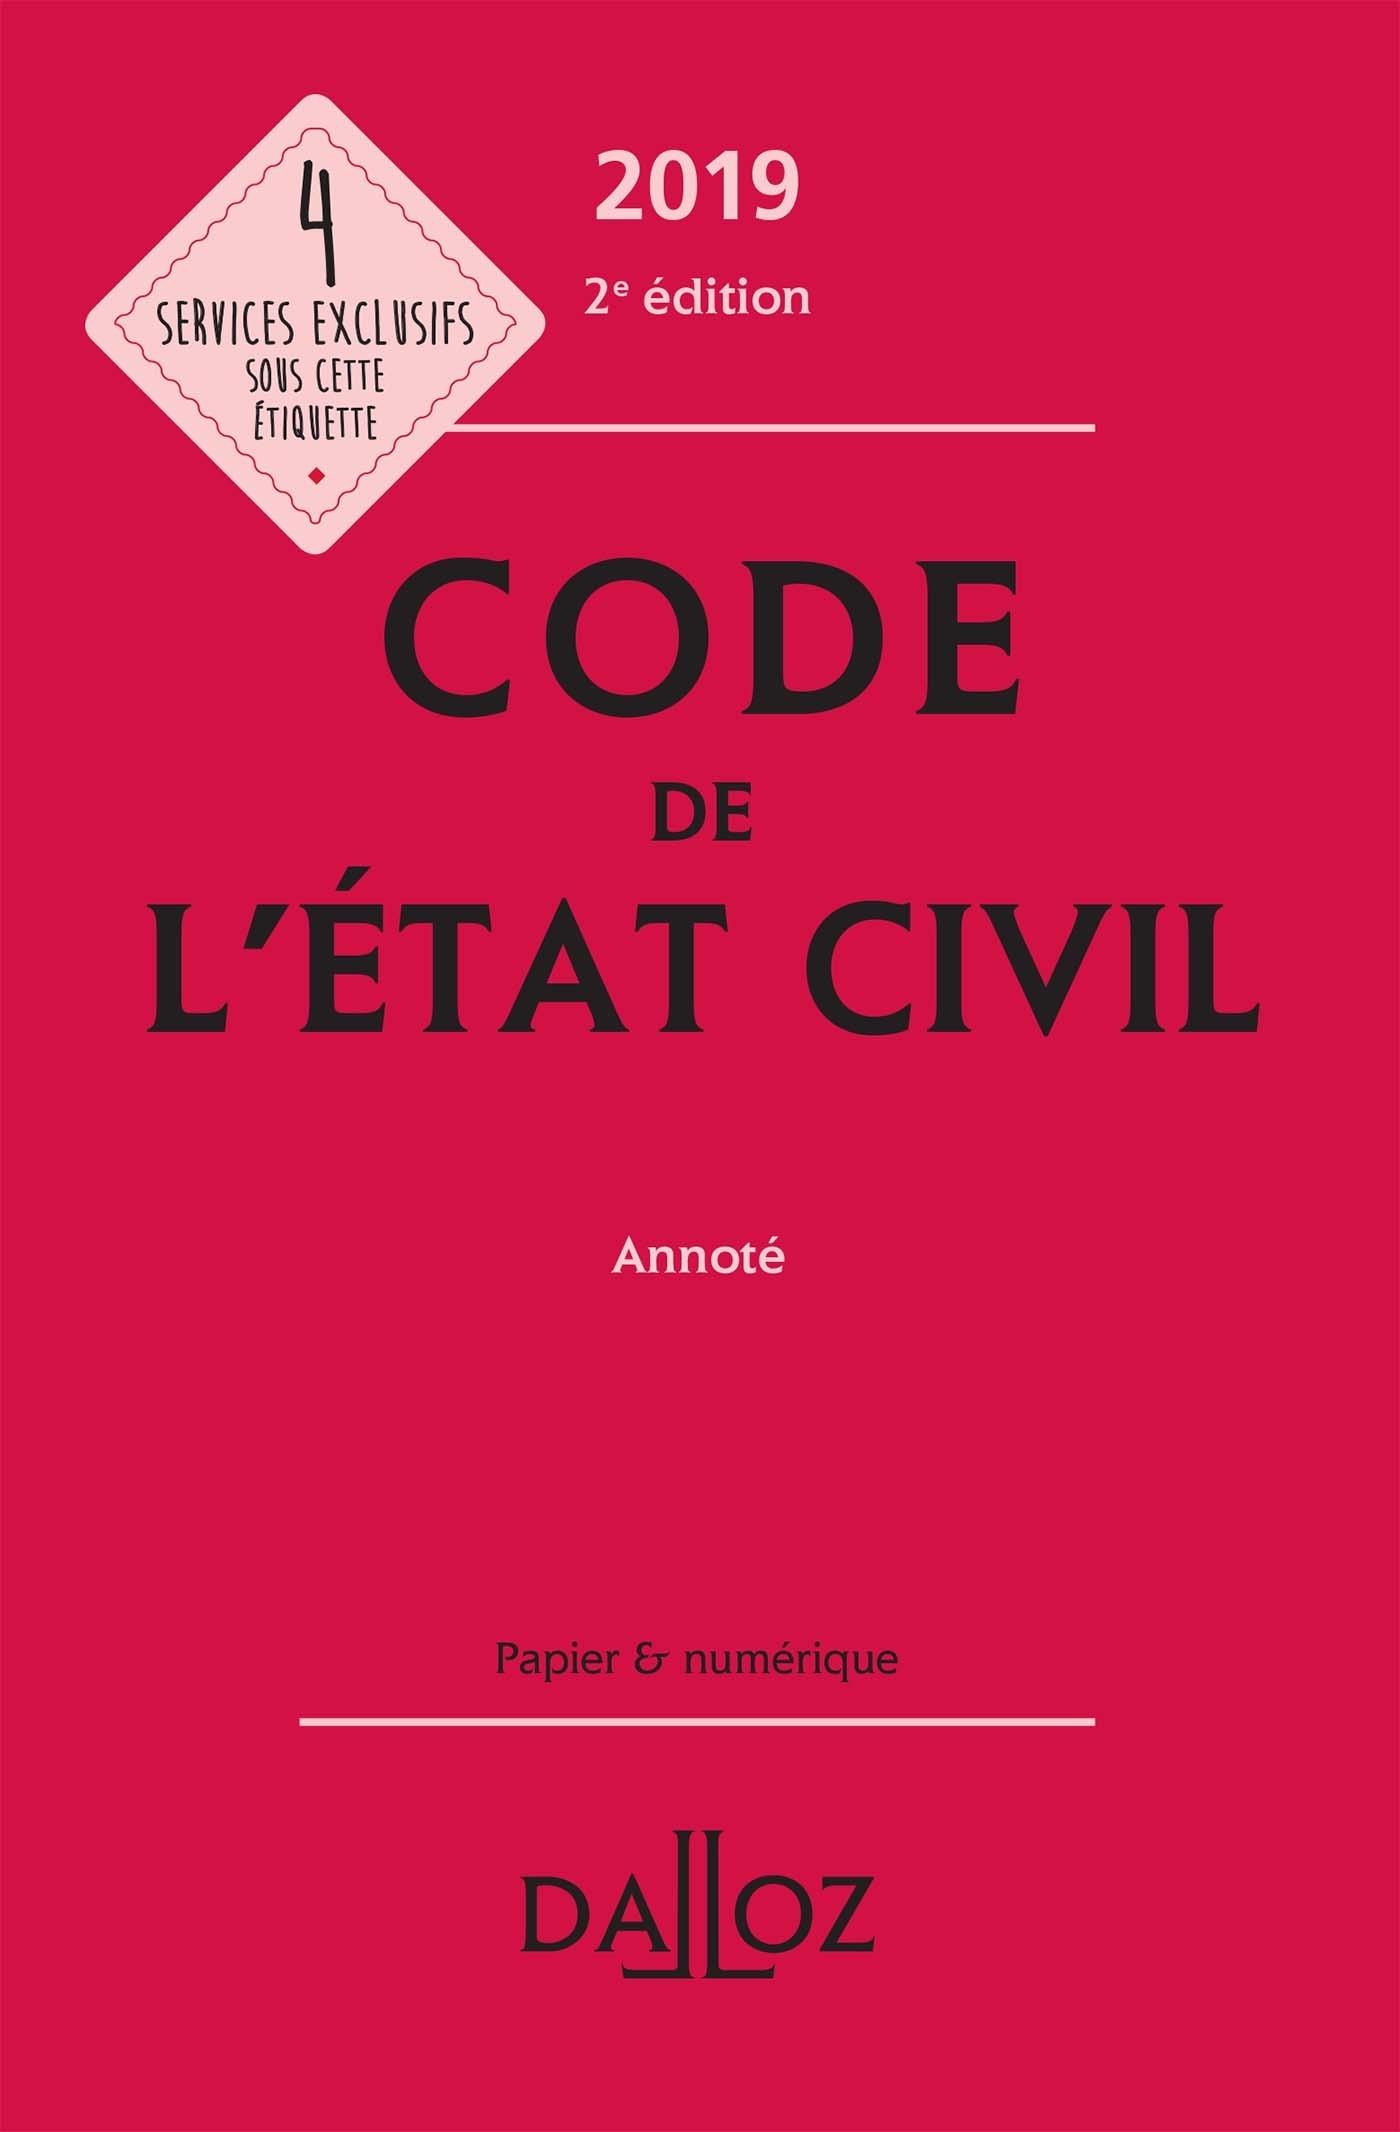 CODE DE L'ETAT CIVIL 2019, ANNOTE - 2E ED.